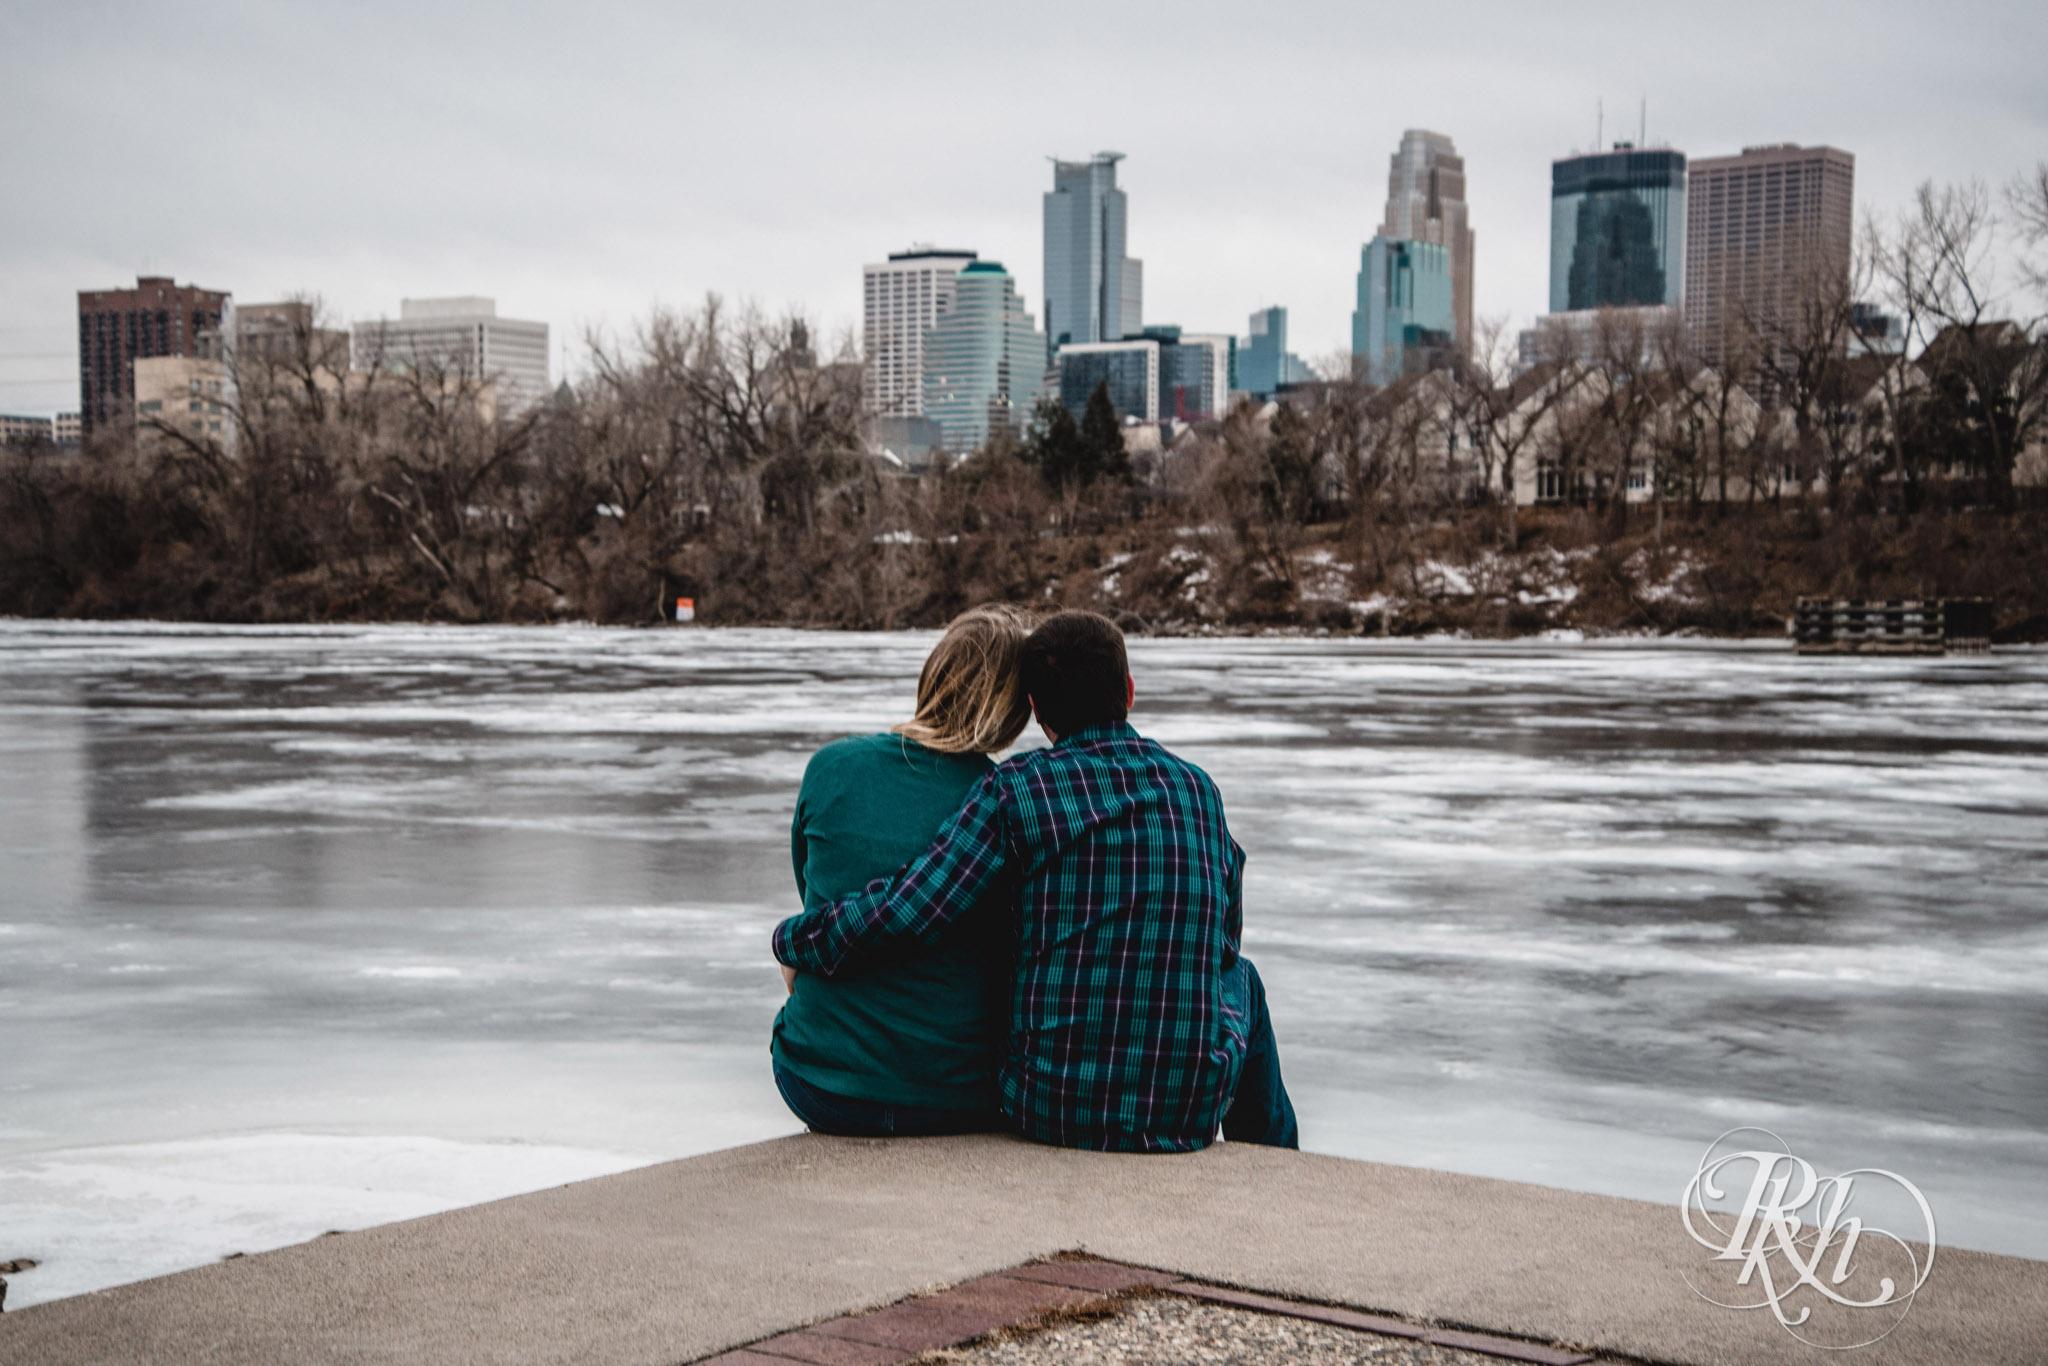 Libby & Ian - Minneapolis Engagement Photography - Honey Lounge - RKH Images (4 of 26).jpg